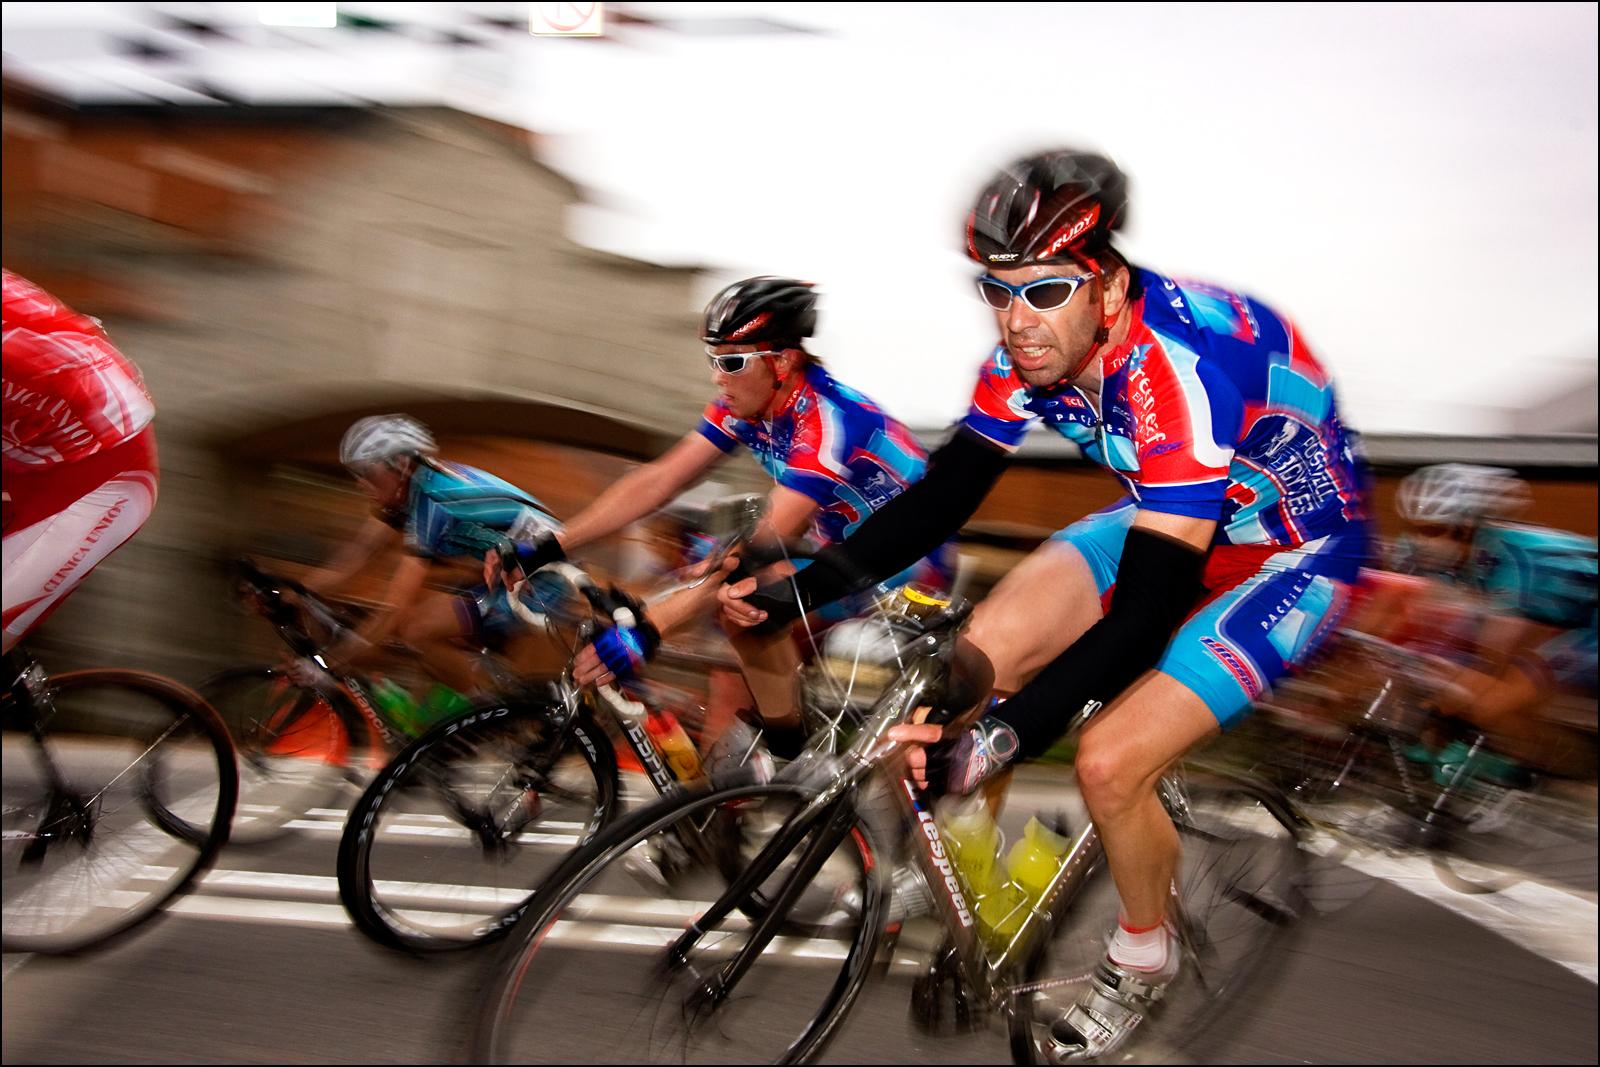 Bikers turn a corner of the Tour De Georgia bike race in Gainesville, GA.